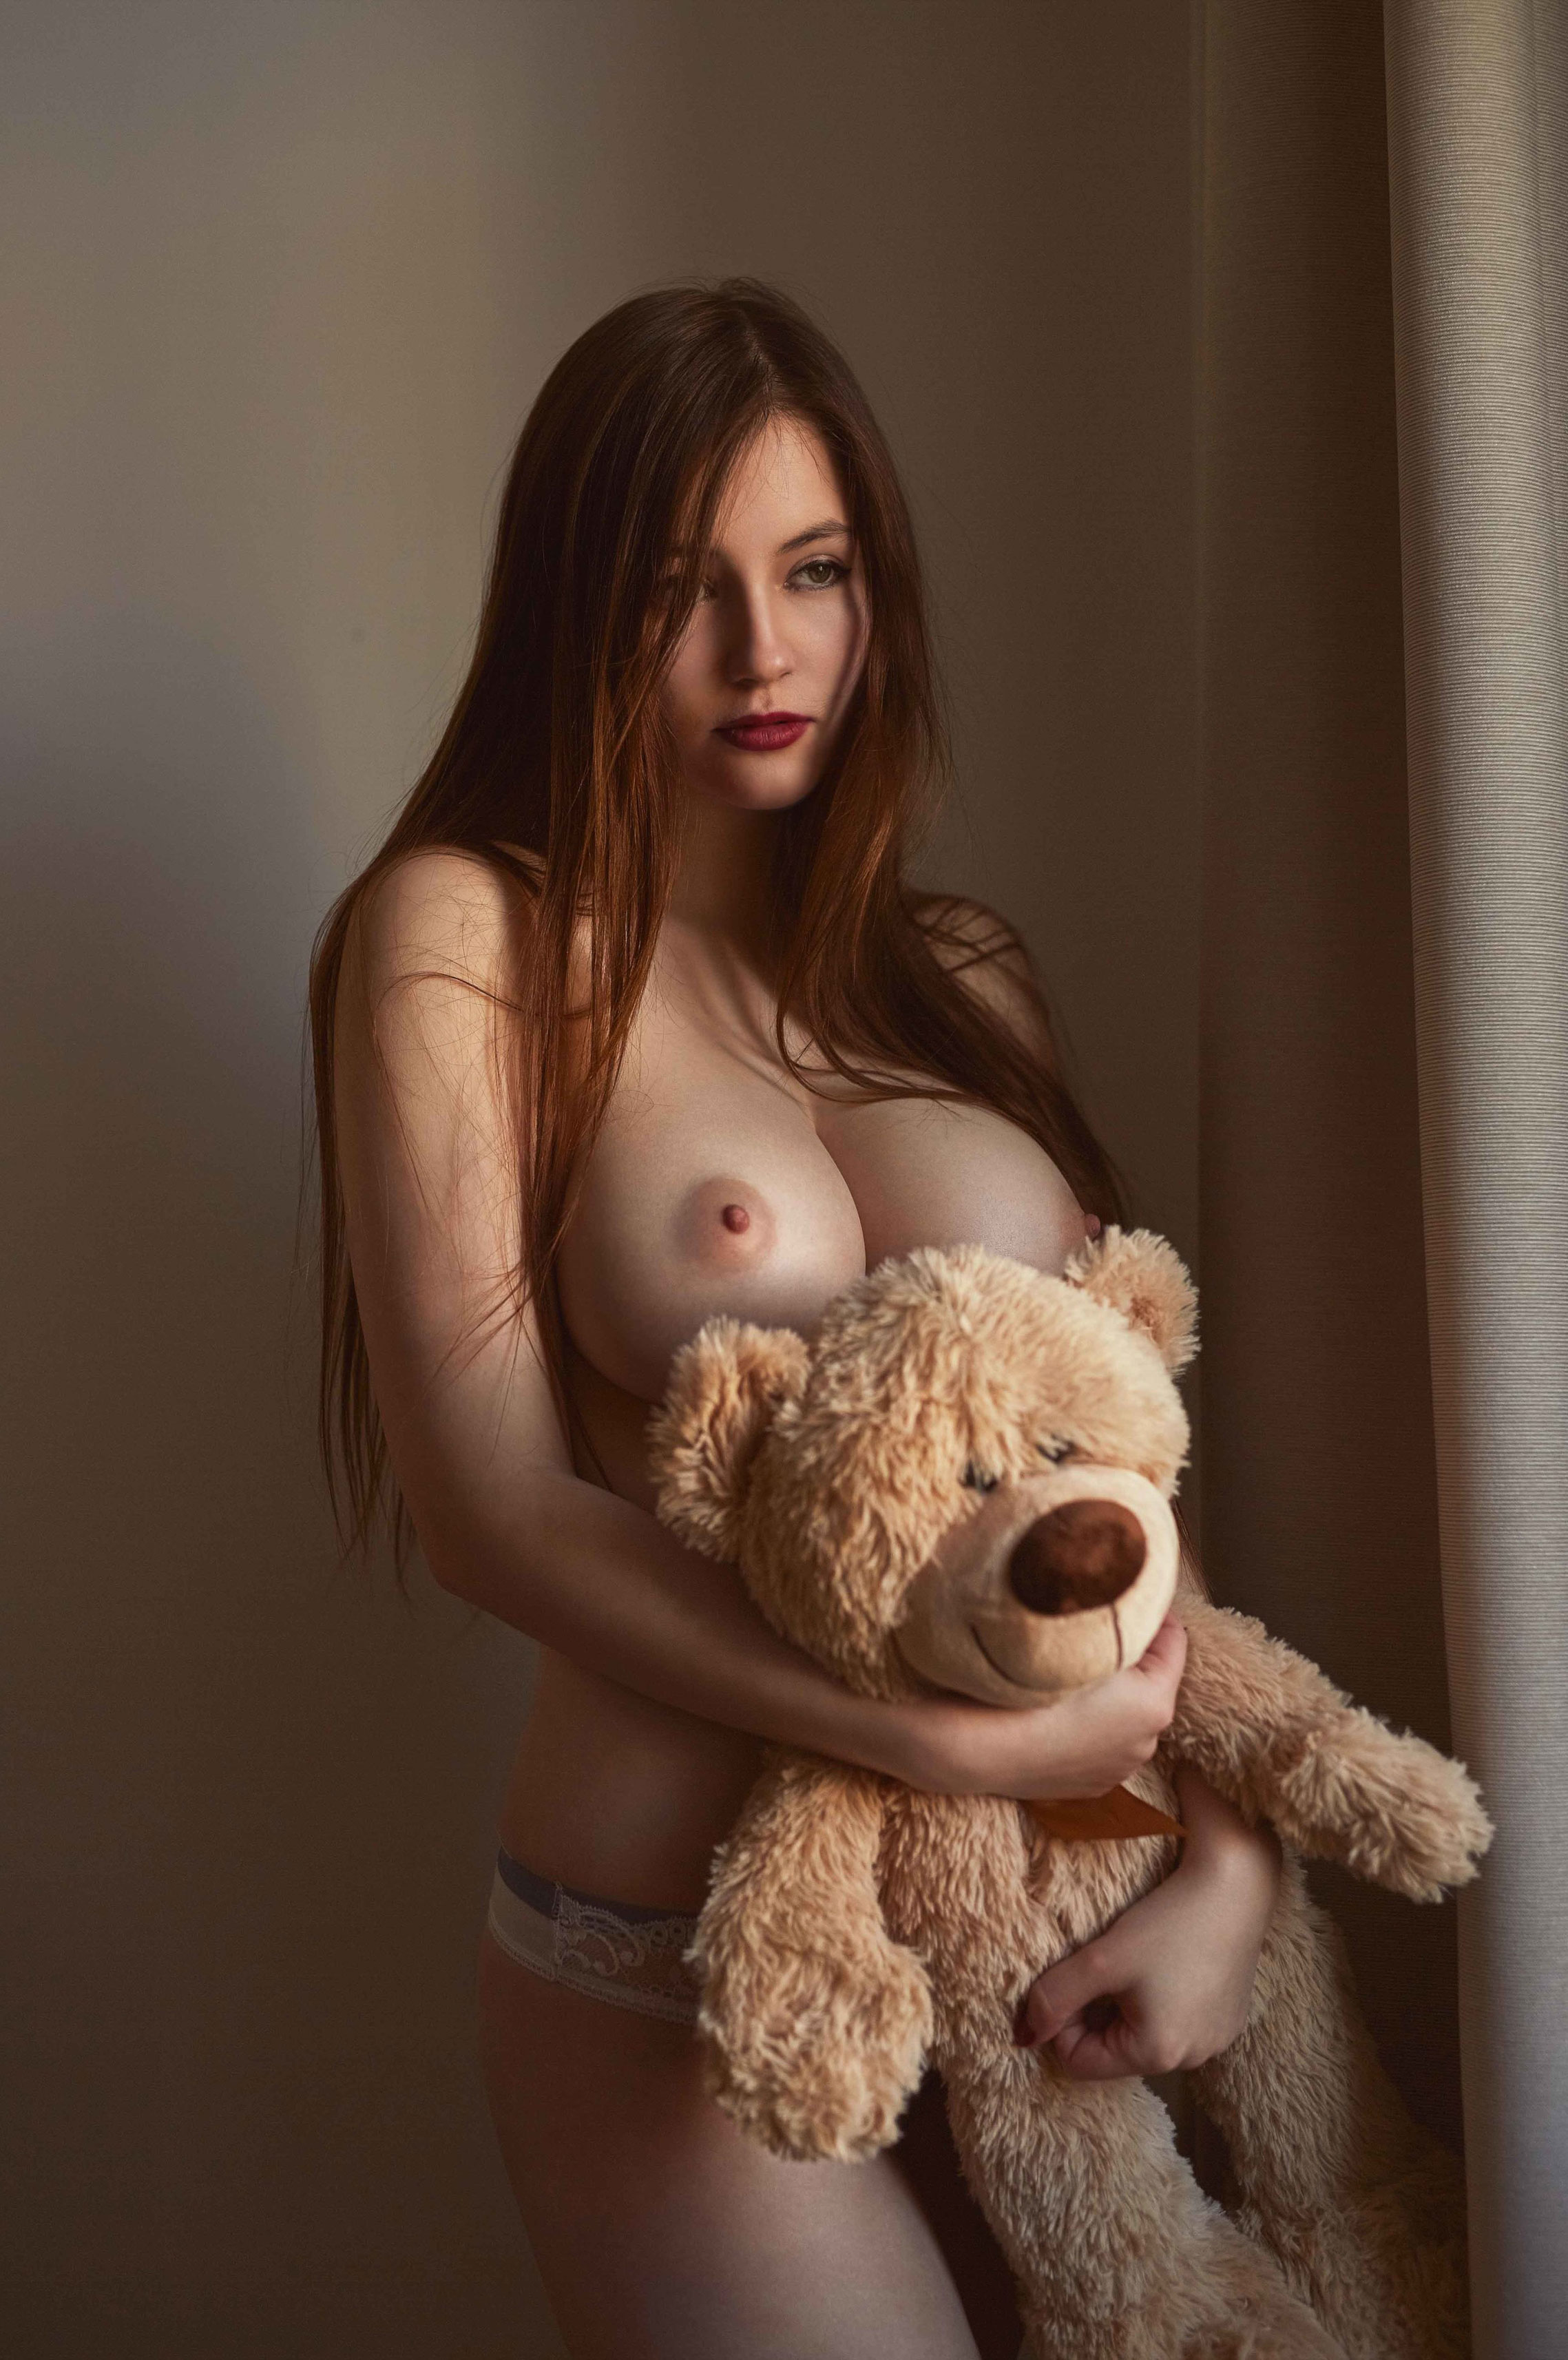 TeddyBear and Mia Schmidt nude by Martin Strauss